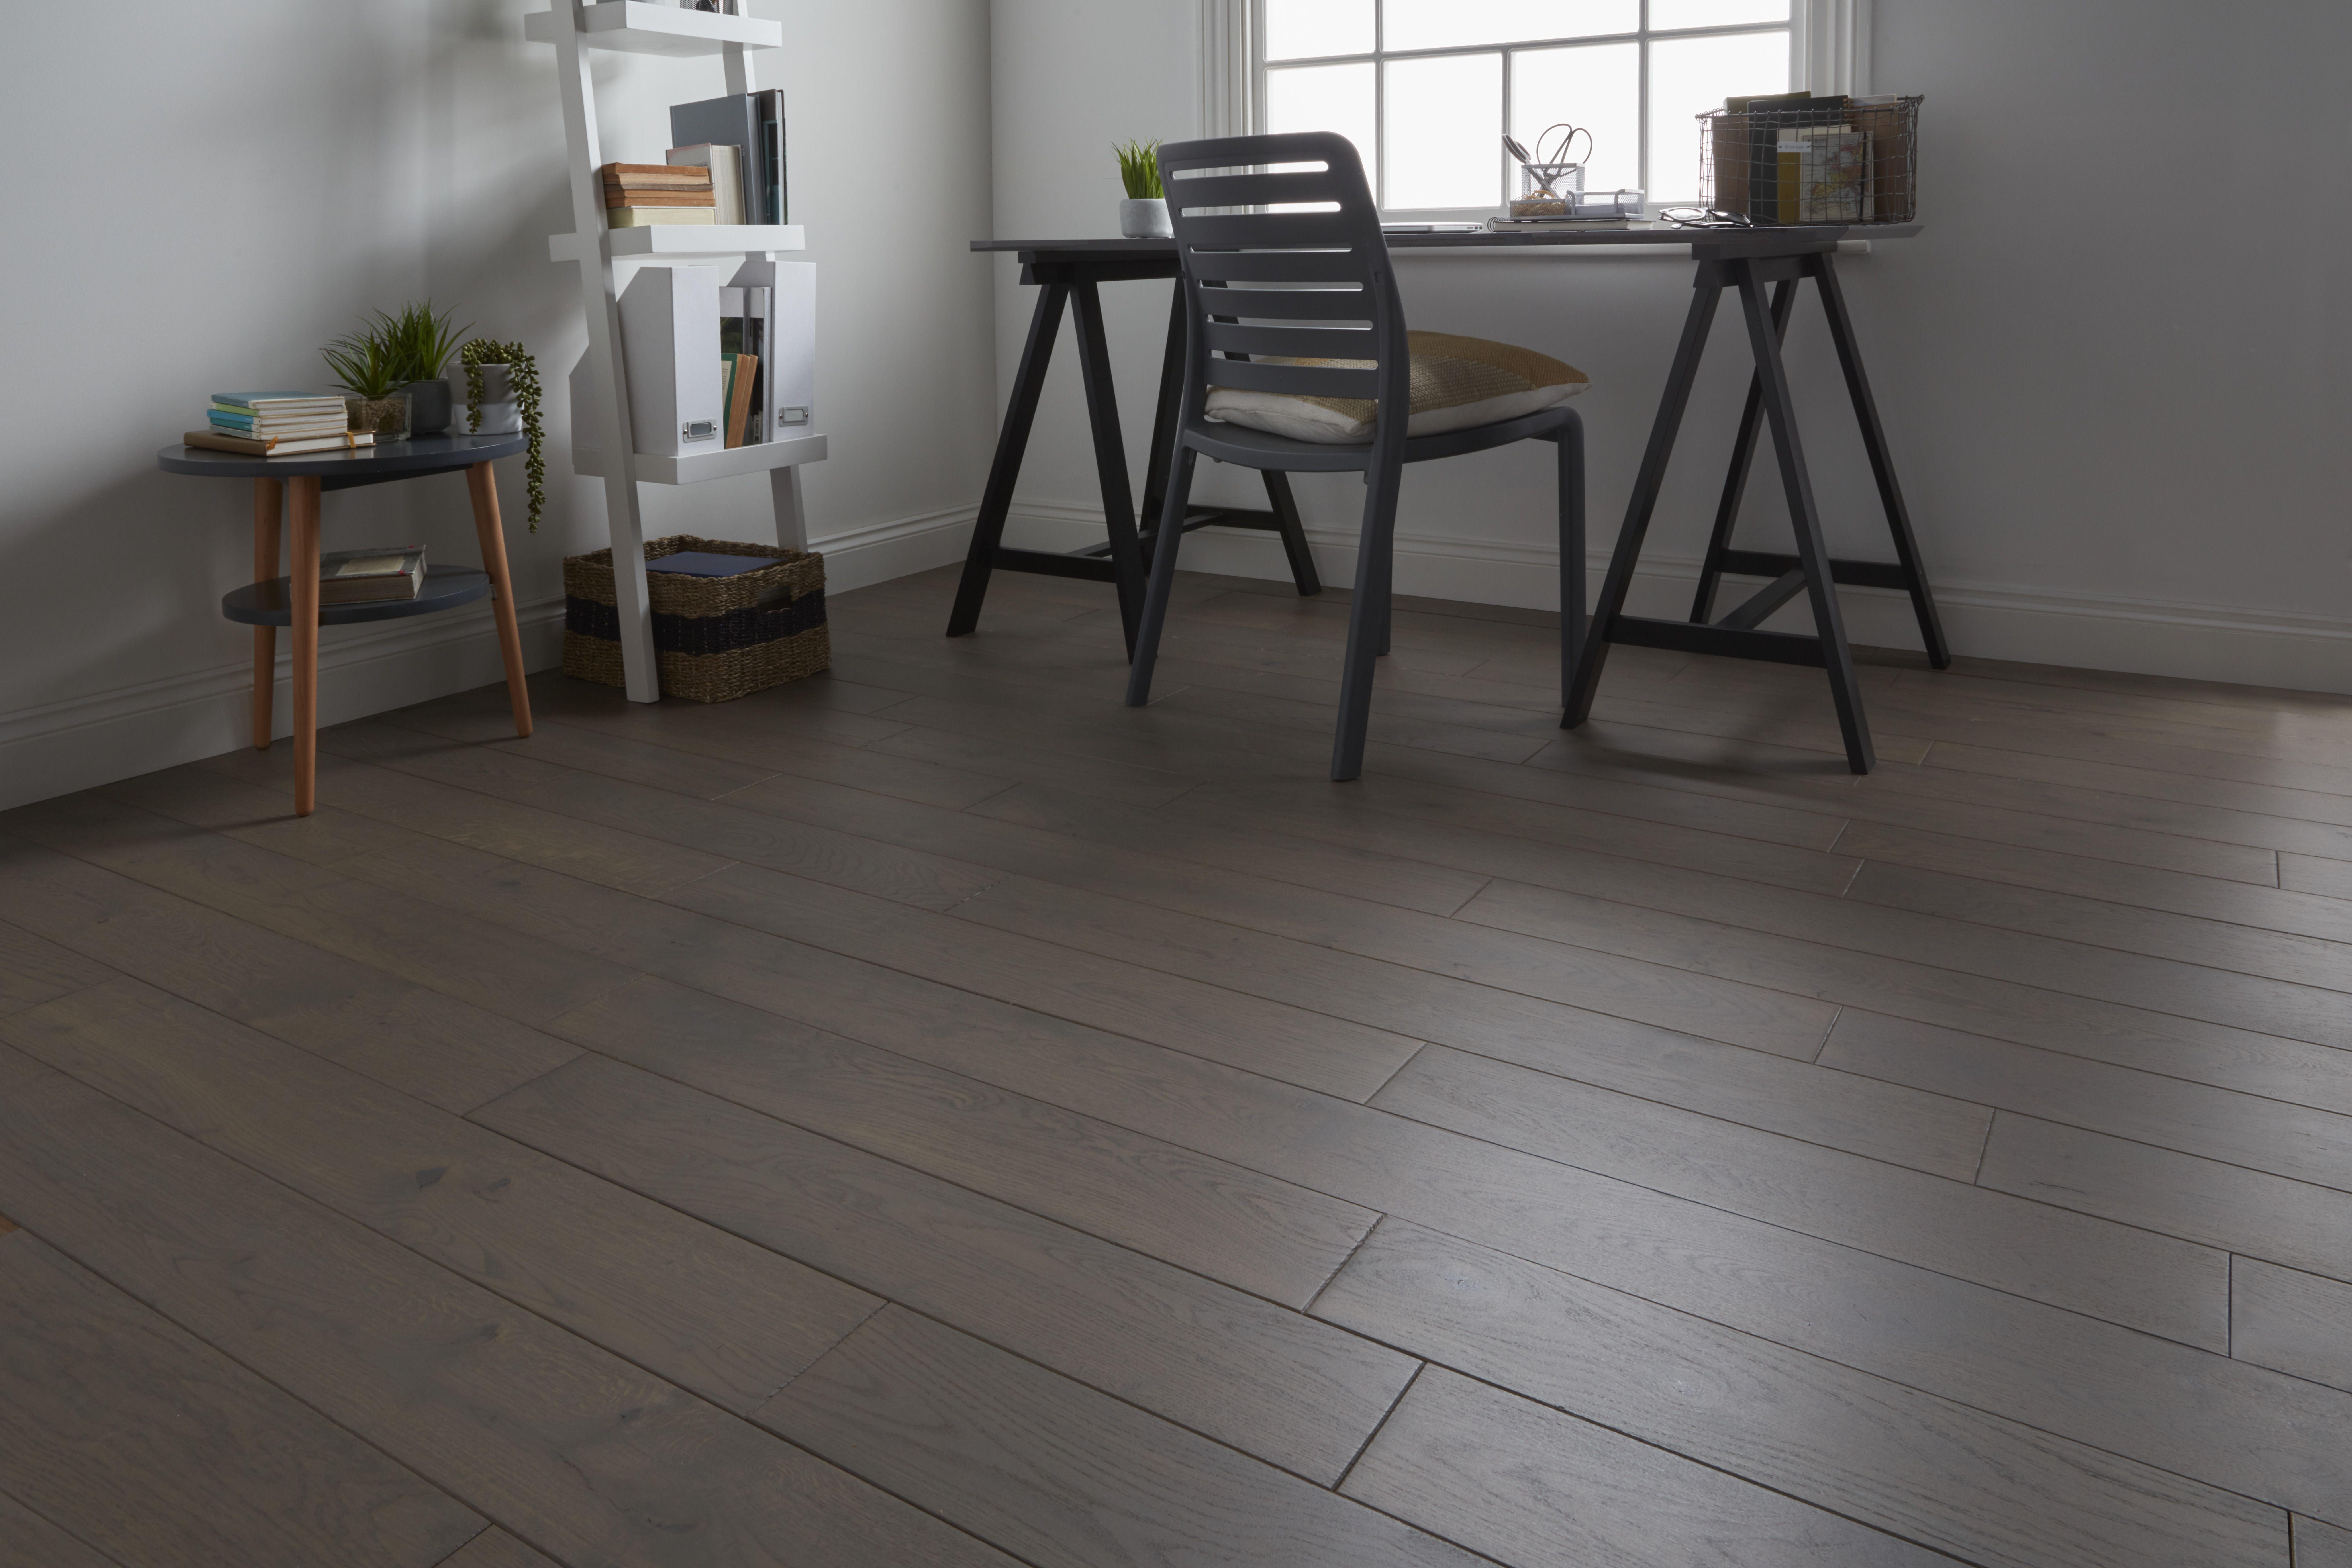 Deska Podlogowa Goodhome Saffle Dab 20 X 130 Mm 1 56 M2 Deski Podlogowe Flooring Tile Floor Saffle